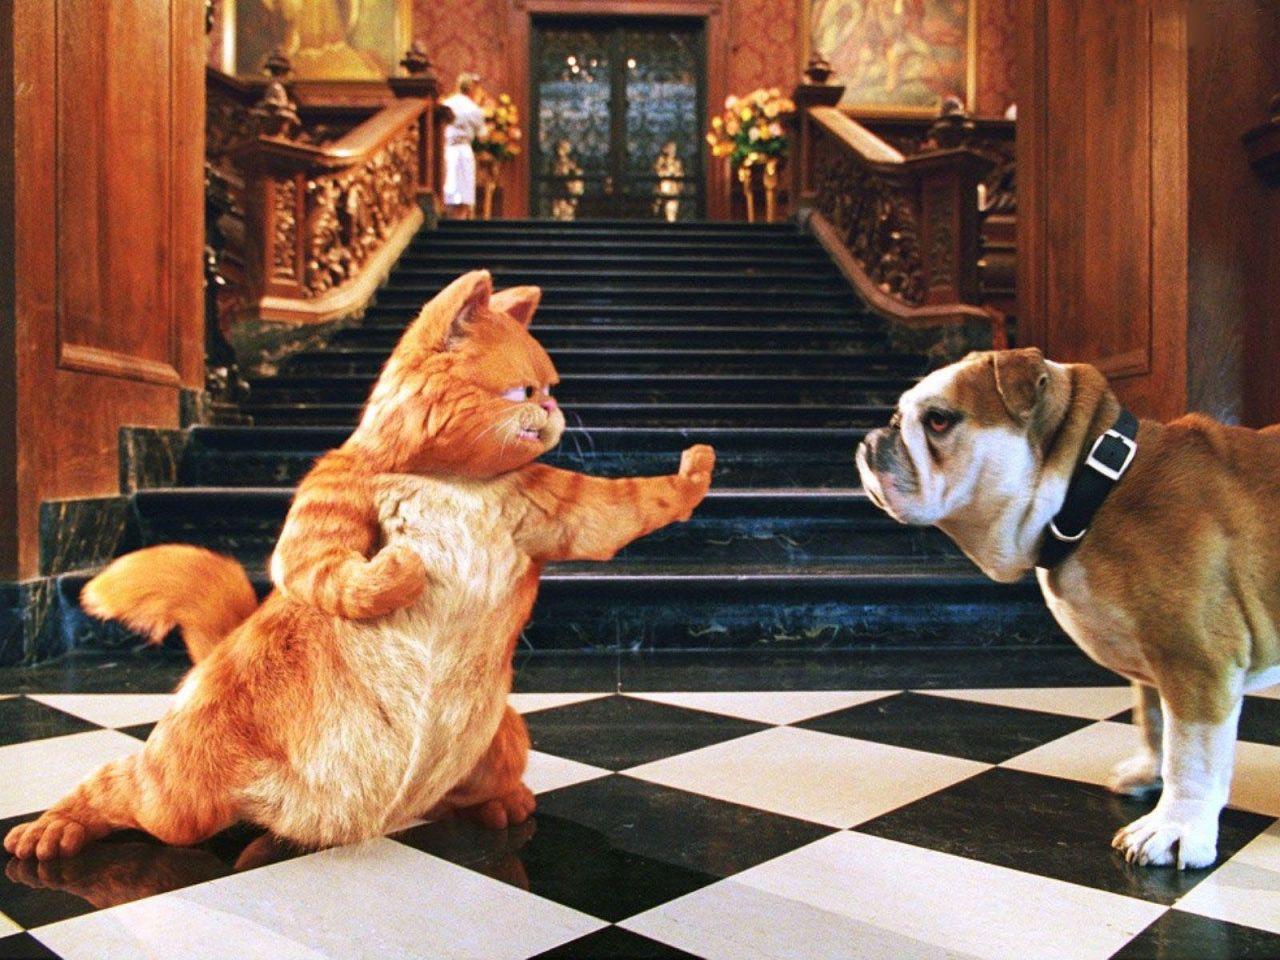 Garfield Karate Pose Wallpaper 1280x960